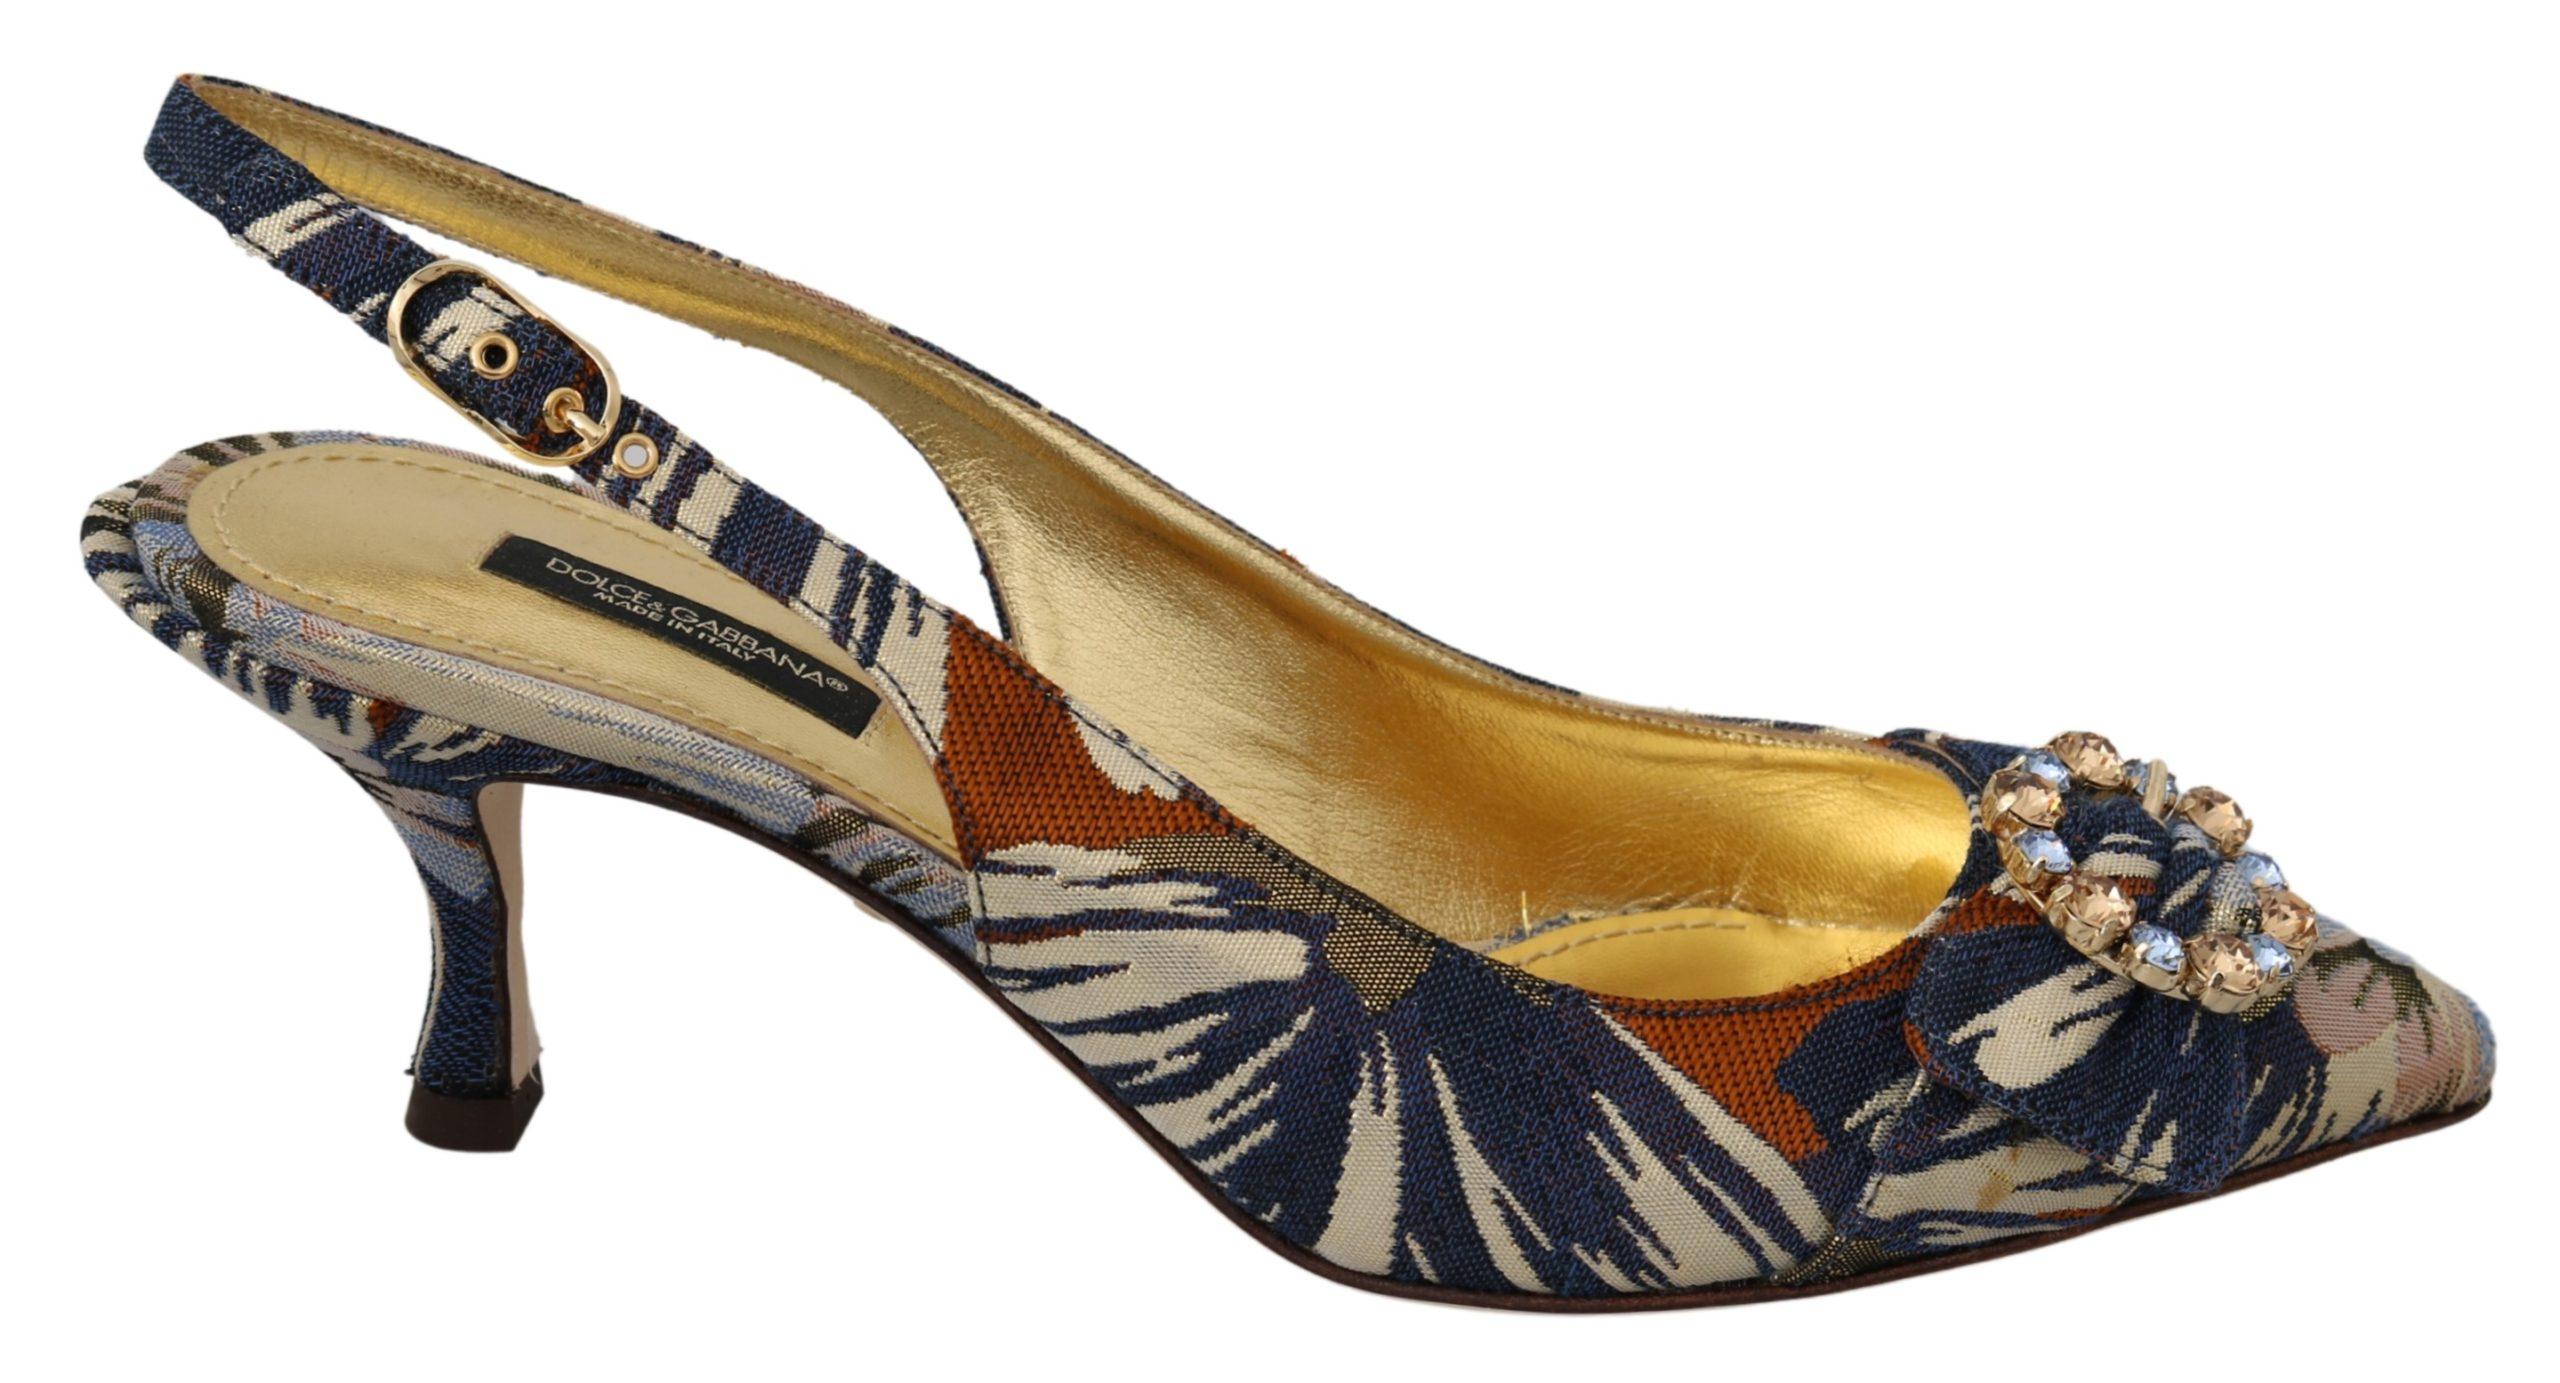 Dolce & Gabbana Women's Slingback Crystal Jacquard Heels Multicolor LA6953 - EU39/US8.5